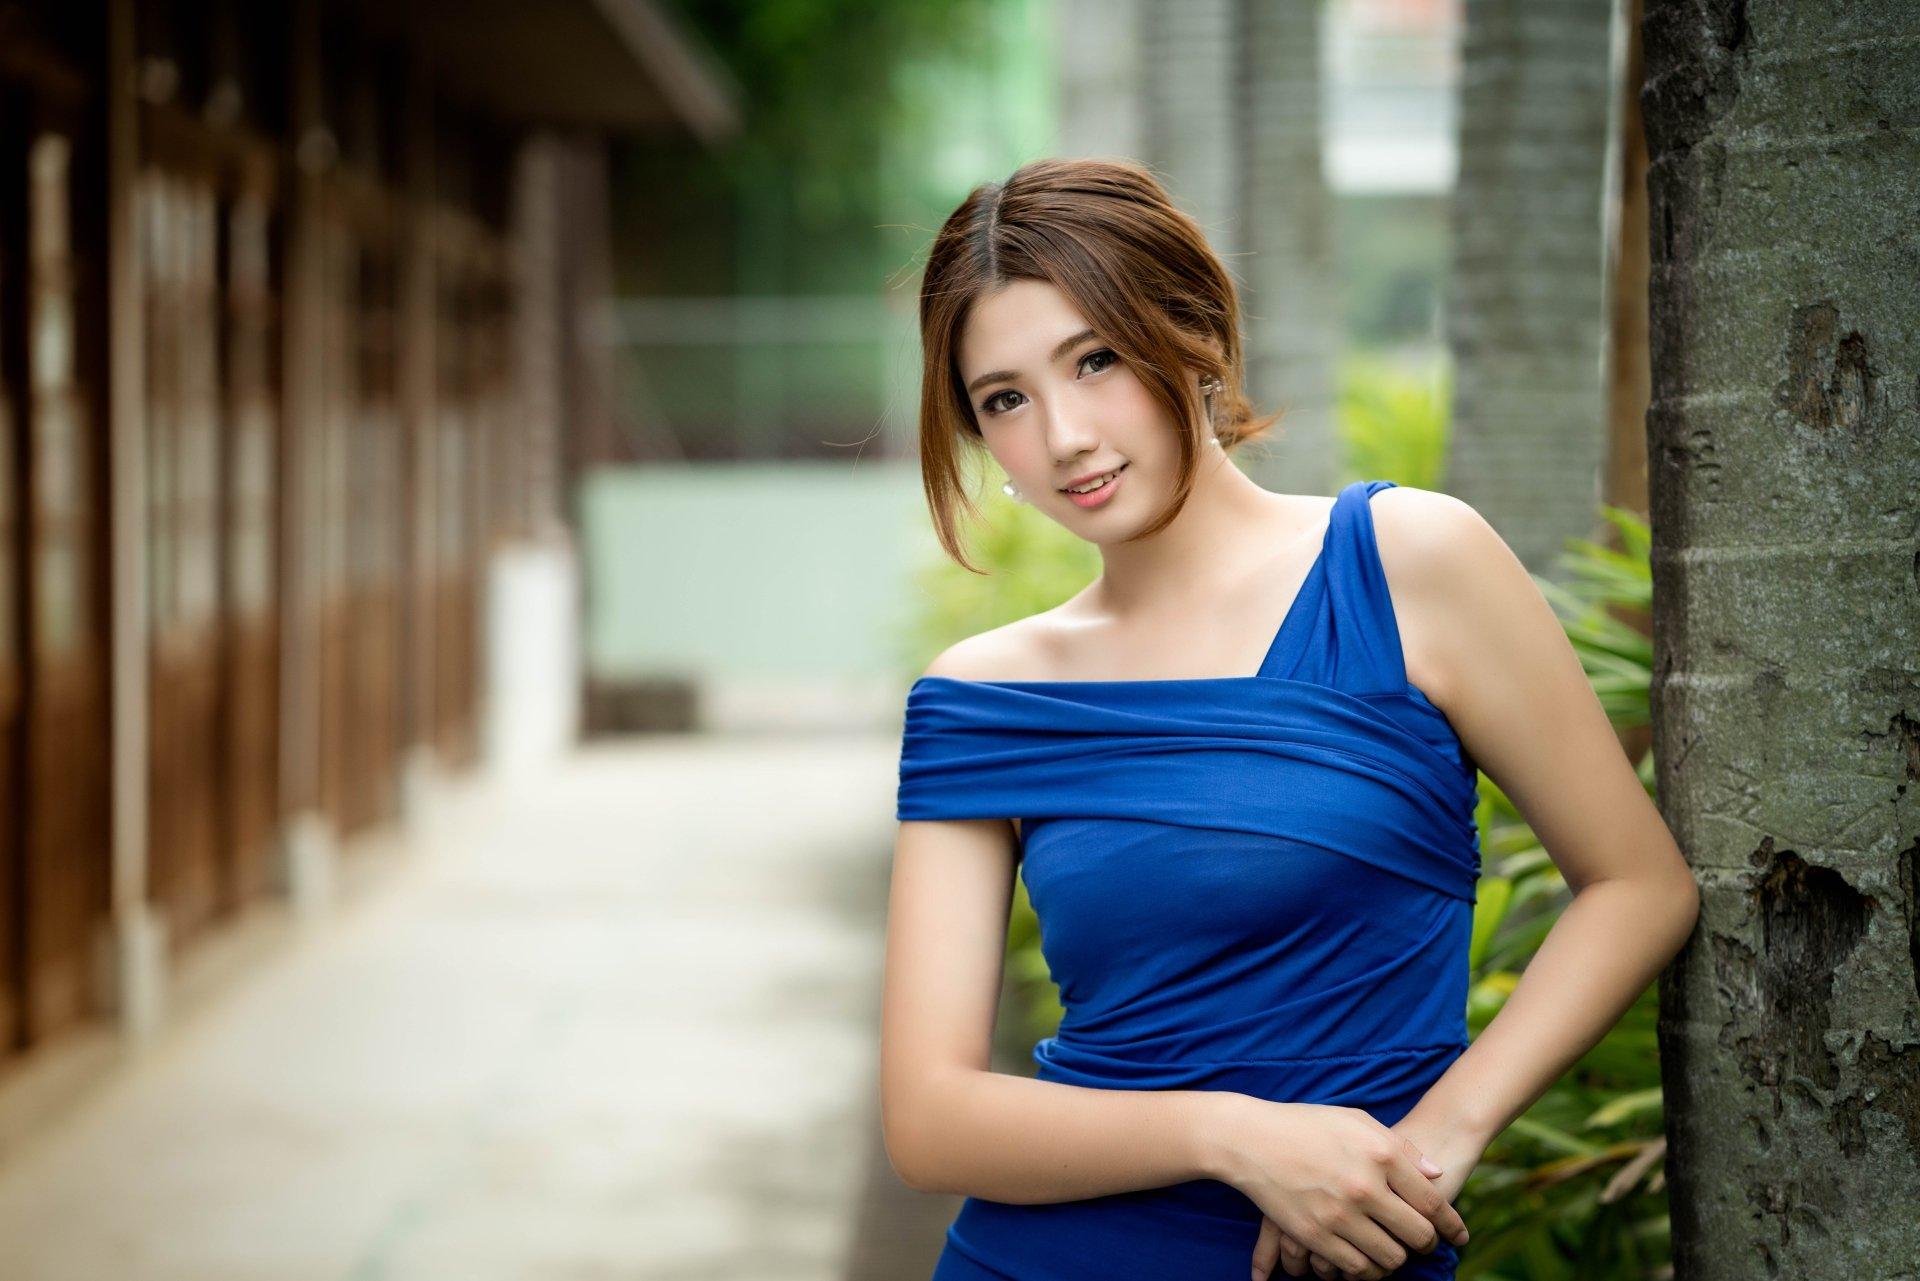 Asian 8k ultra hd wallpaper background image 7952x5304 - Asian girl 4k ...